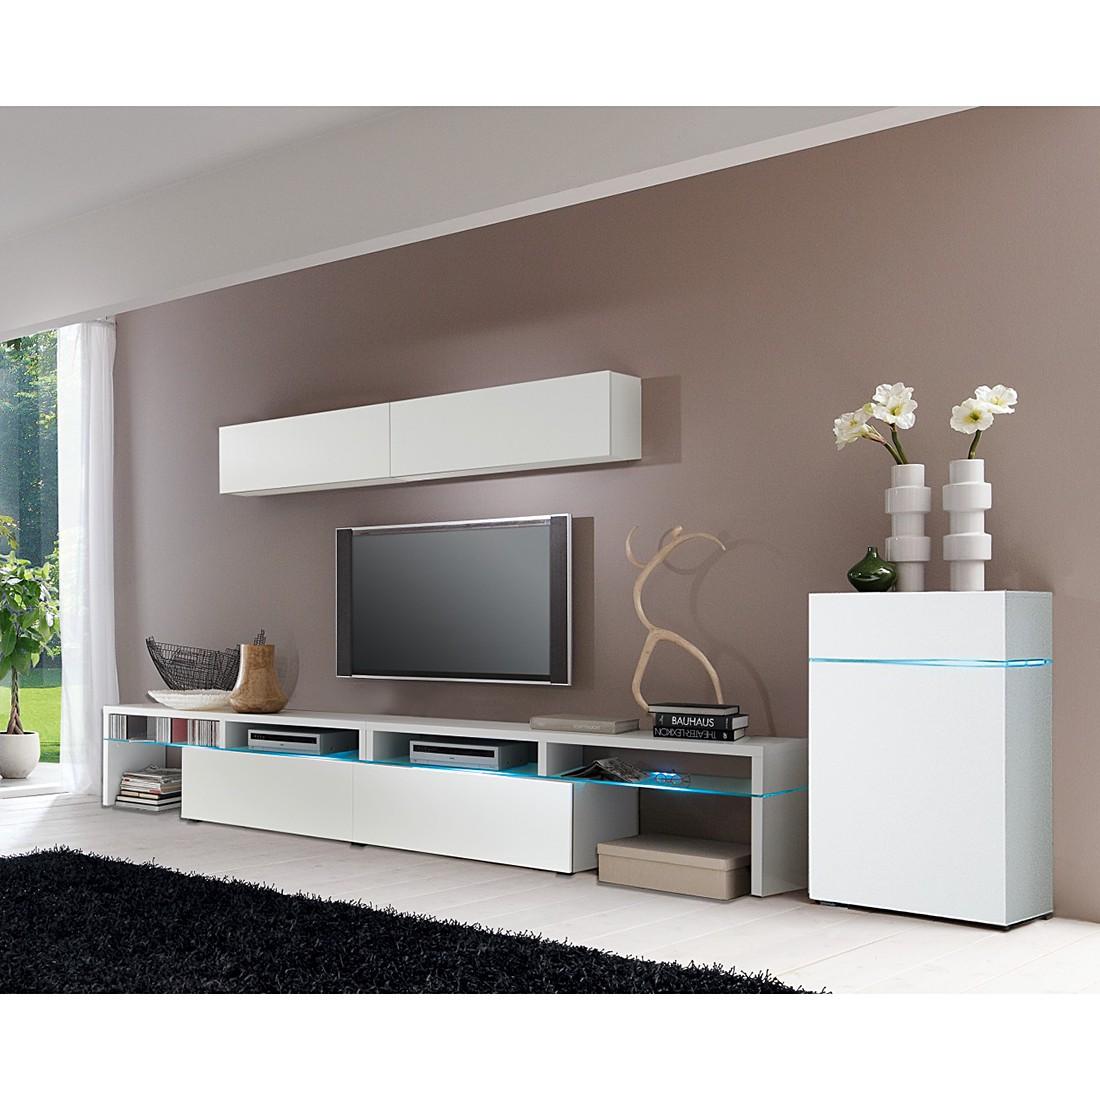 wohnwand colourart 5 teilig eiche sonoma tr ffel dekor lava ohne beleuchtung cs schmal. Black Bedroom Furniture Sets. Home Design Ideas